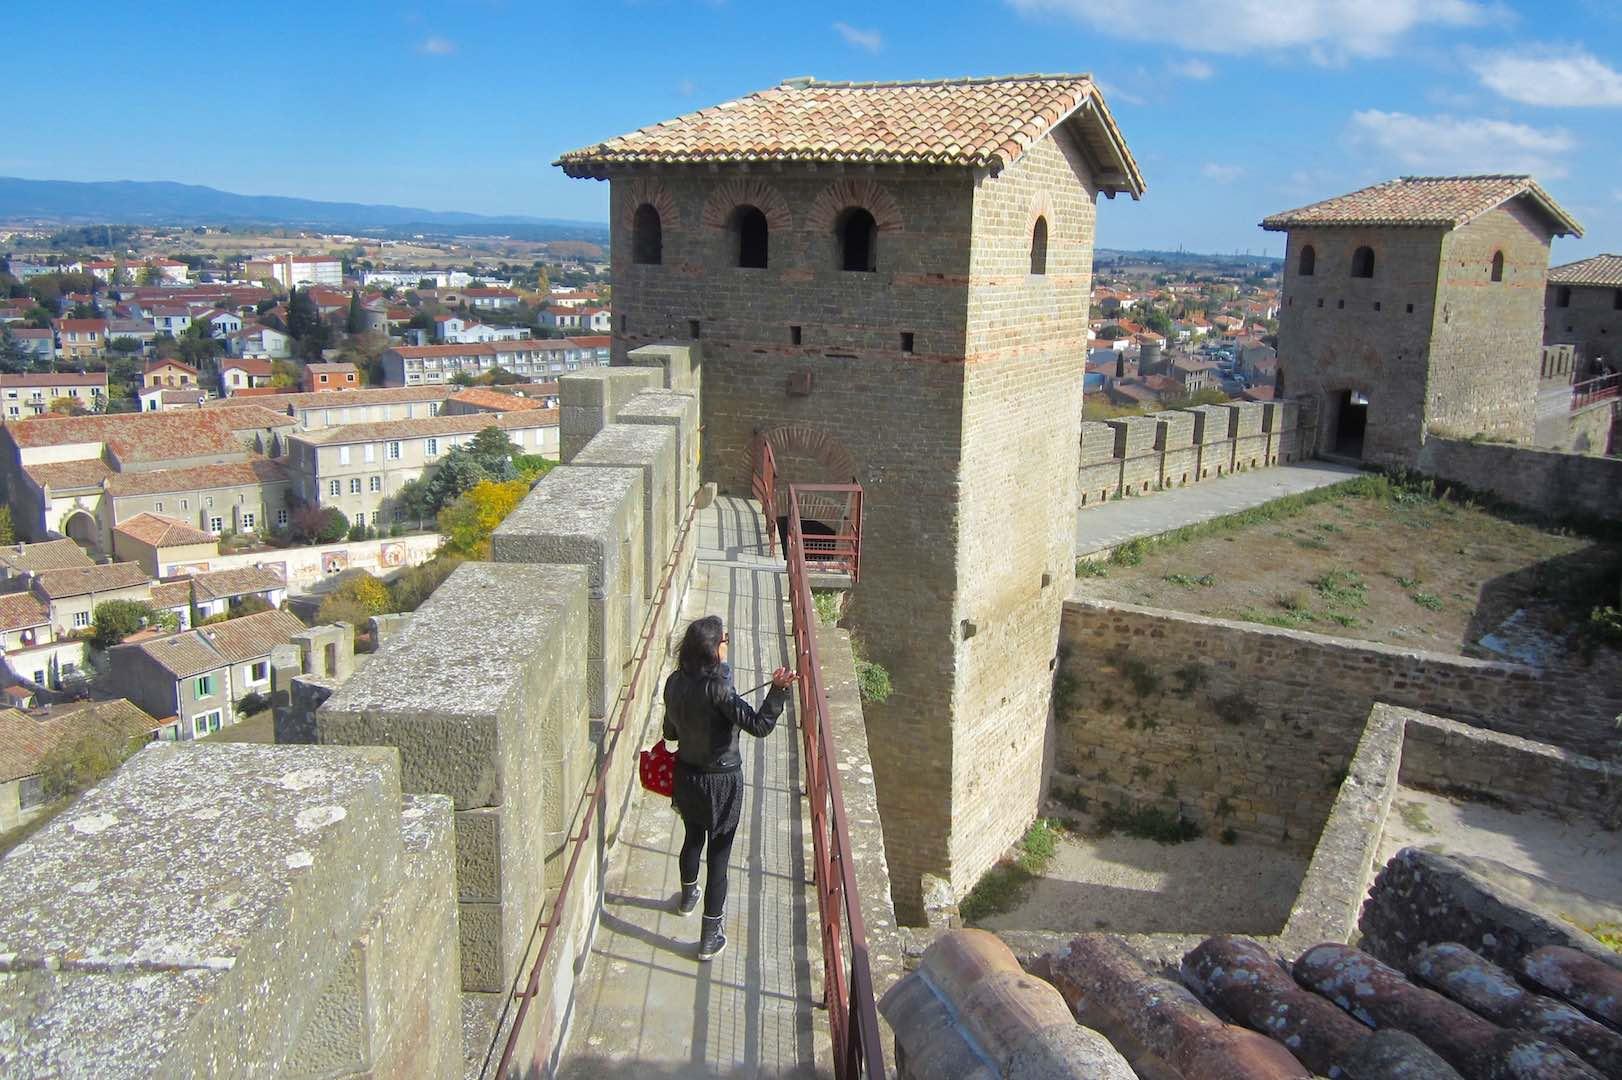 Paseando por las murallas. ©M. Calvo.